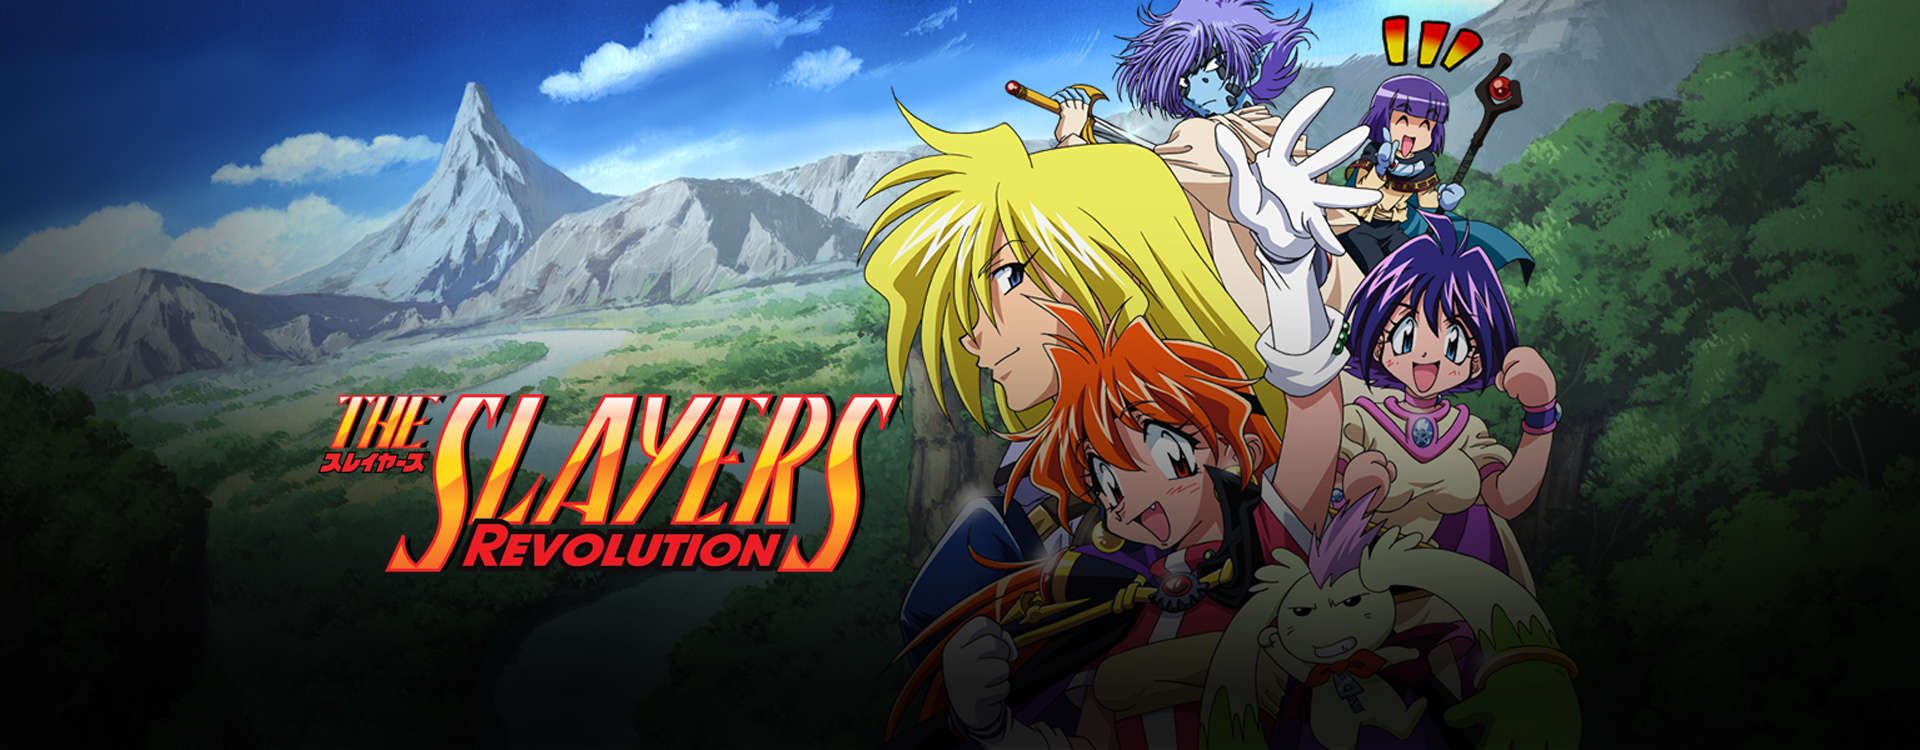 The Slayers Revolution